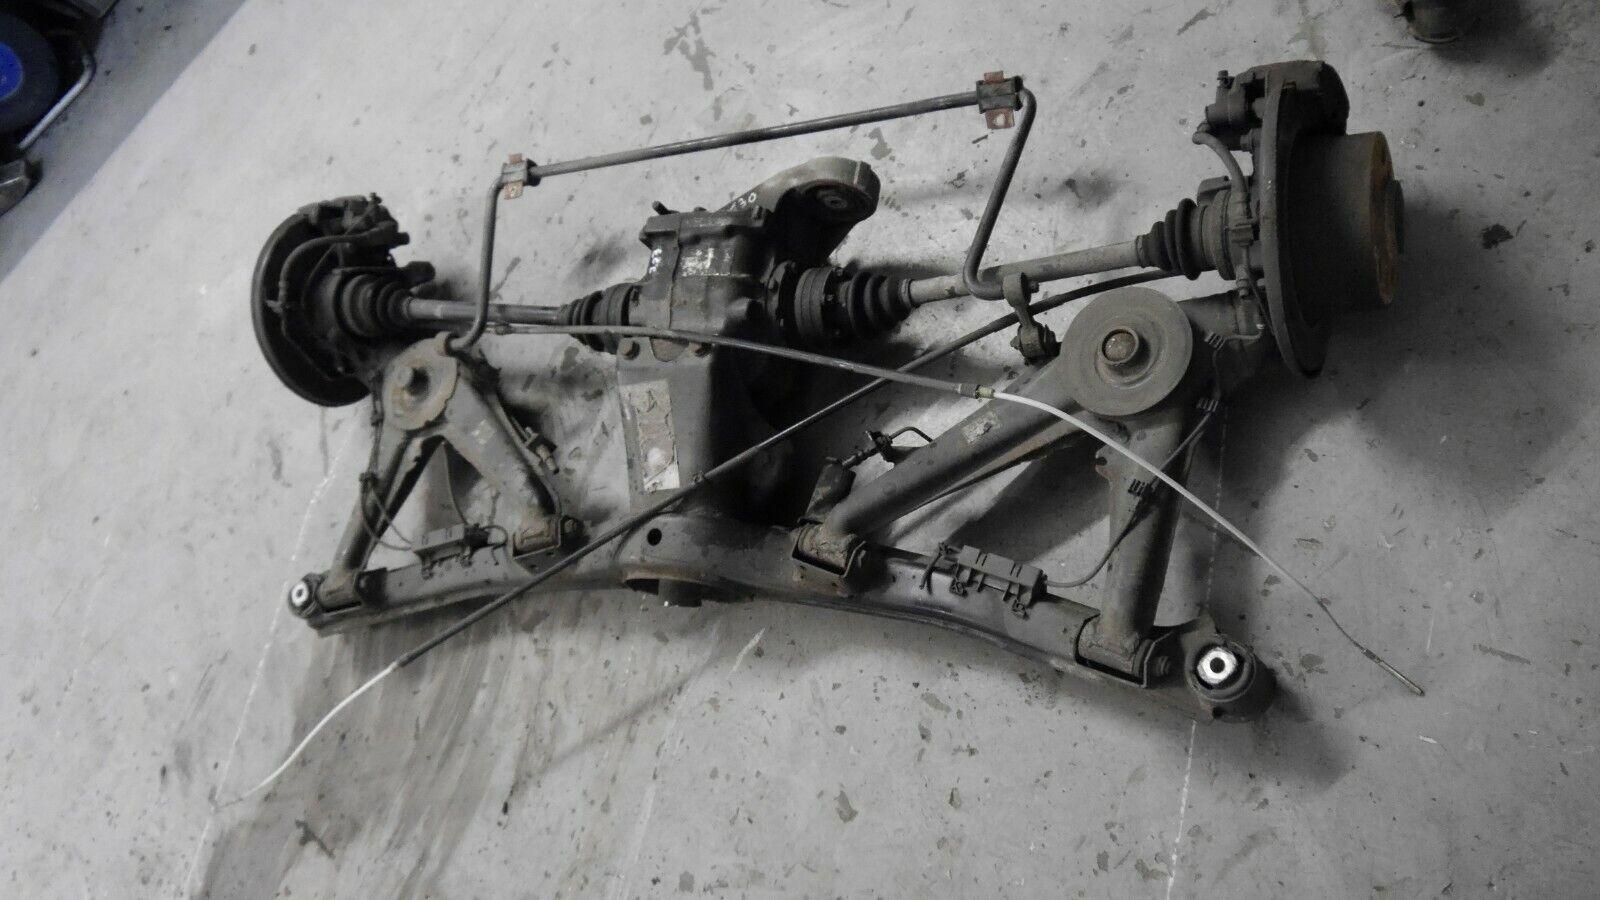 2x MEYLE Achskörperlager Lagerung Achskörper Mercedes 190 W201 Hinterachse L+R